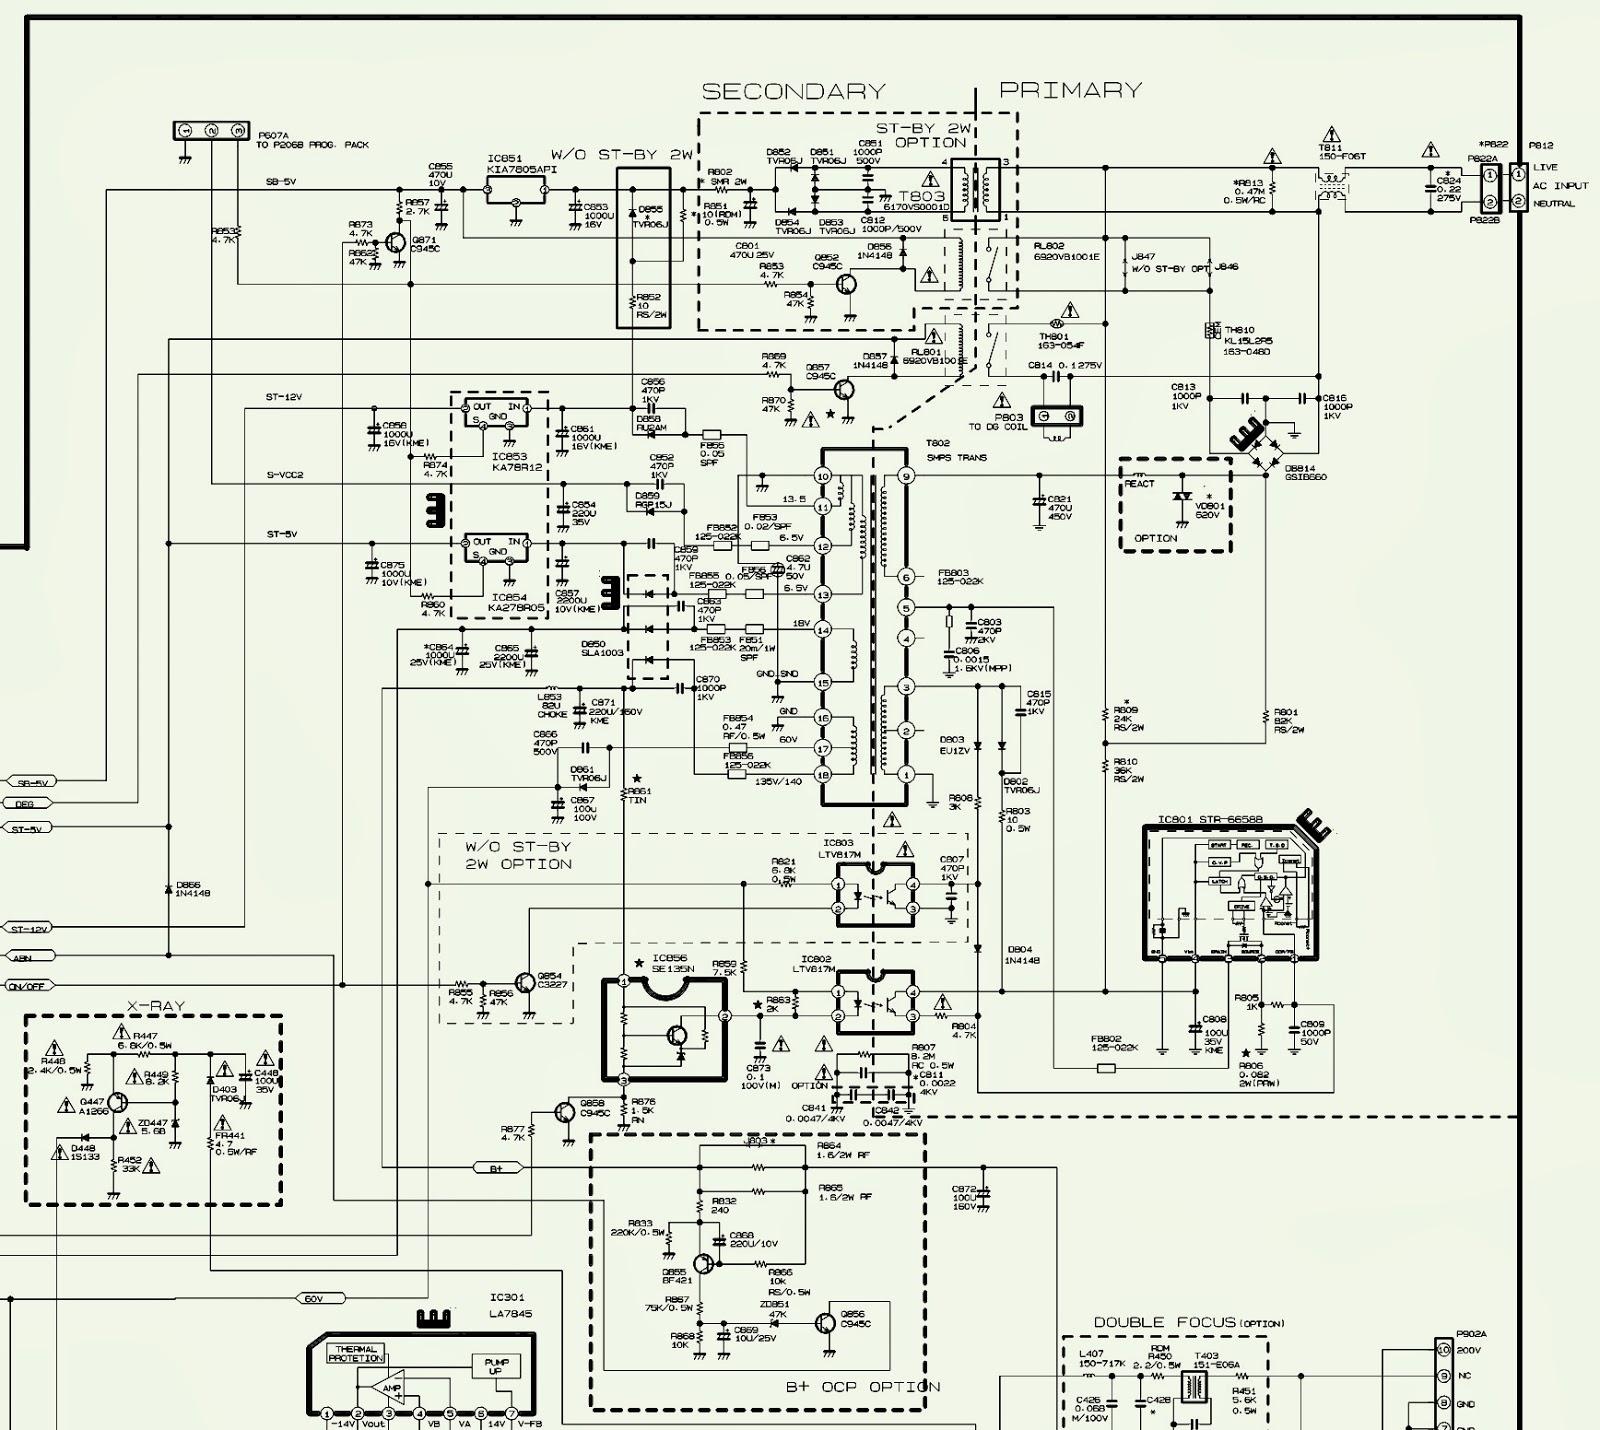 Lg Microwave Oven Circuit Diagram 2009 Subaru Legacy Radio Wiring For Panasonic Inverter